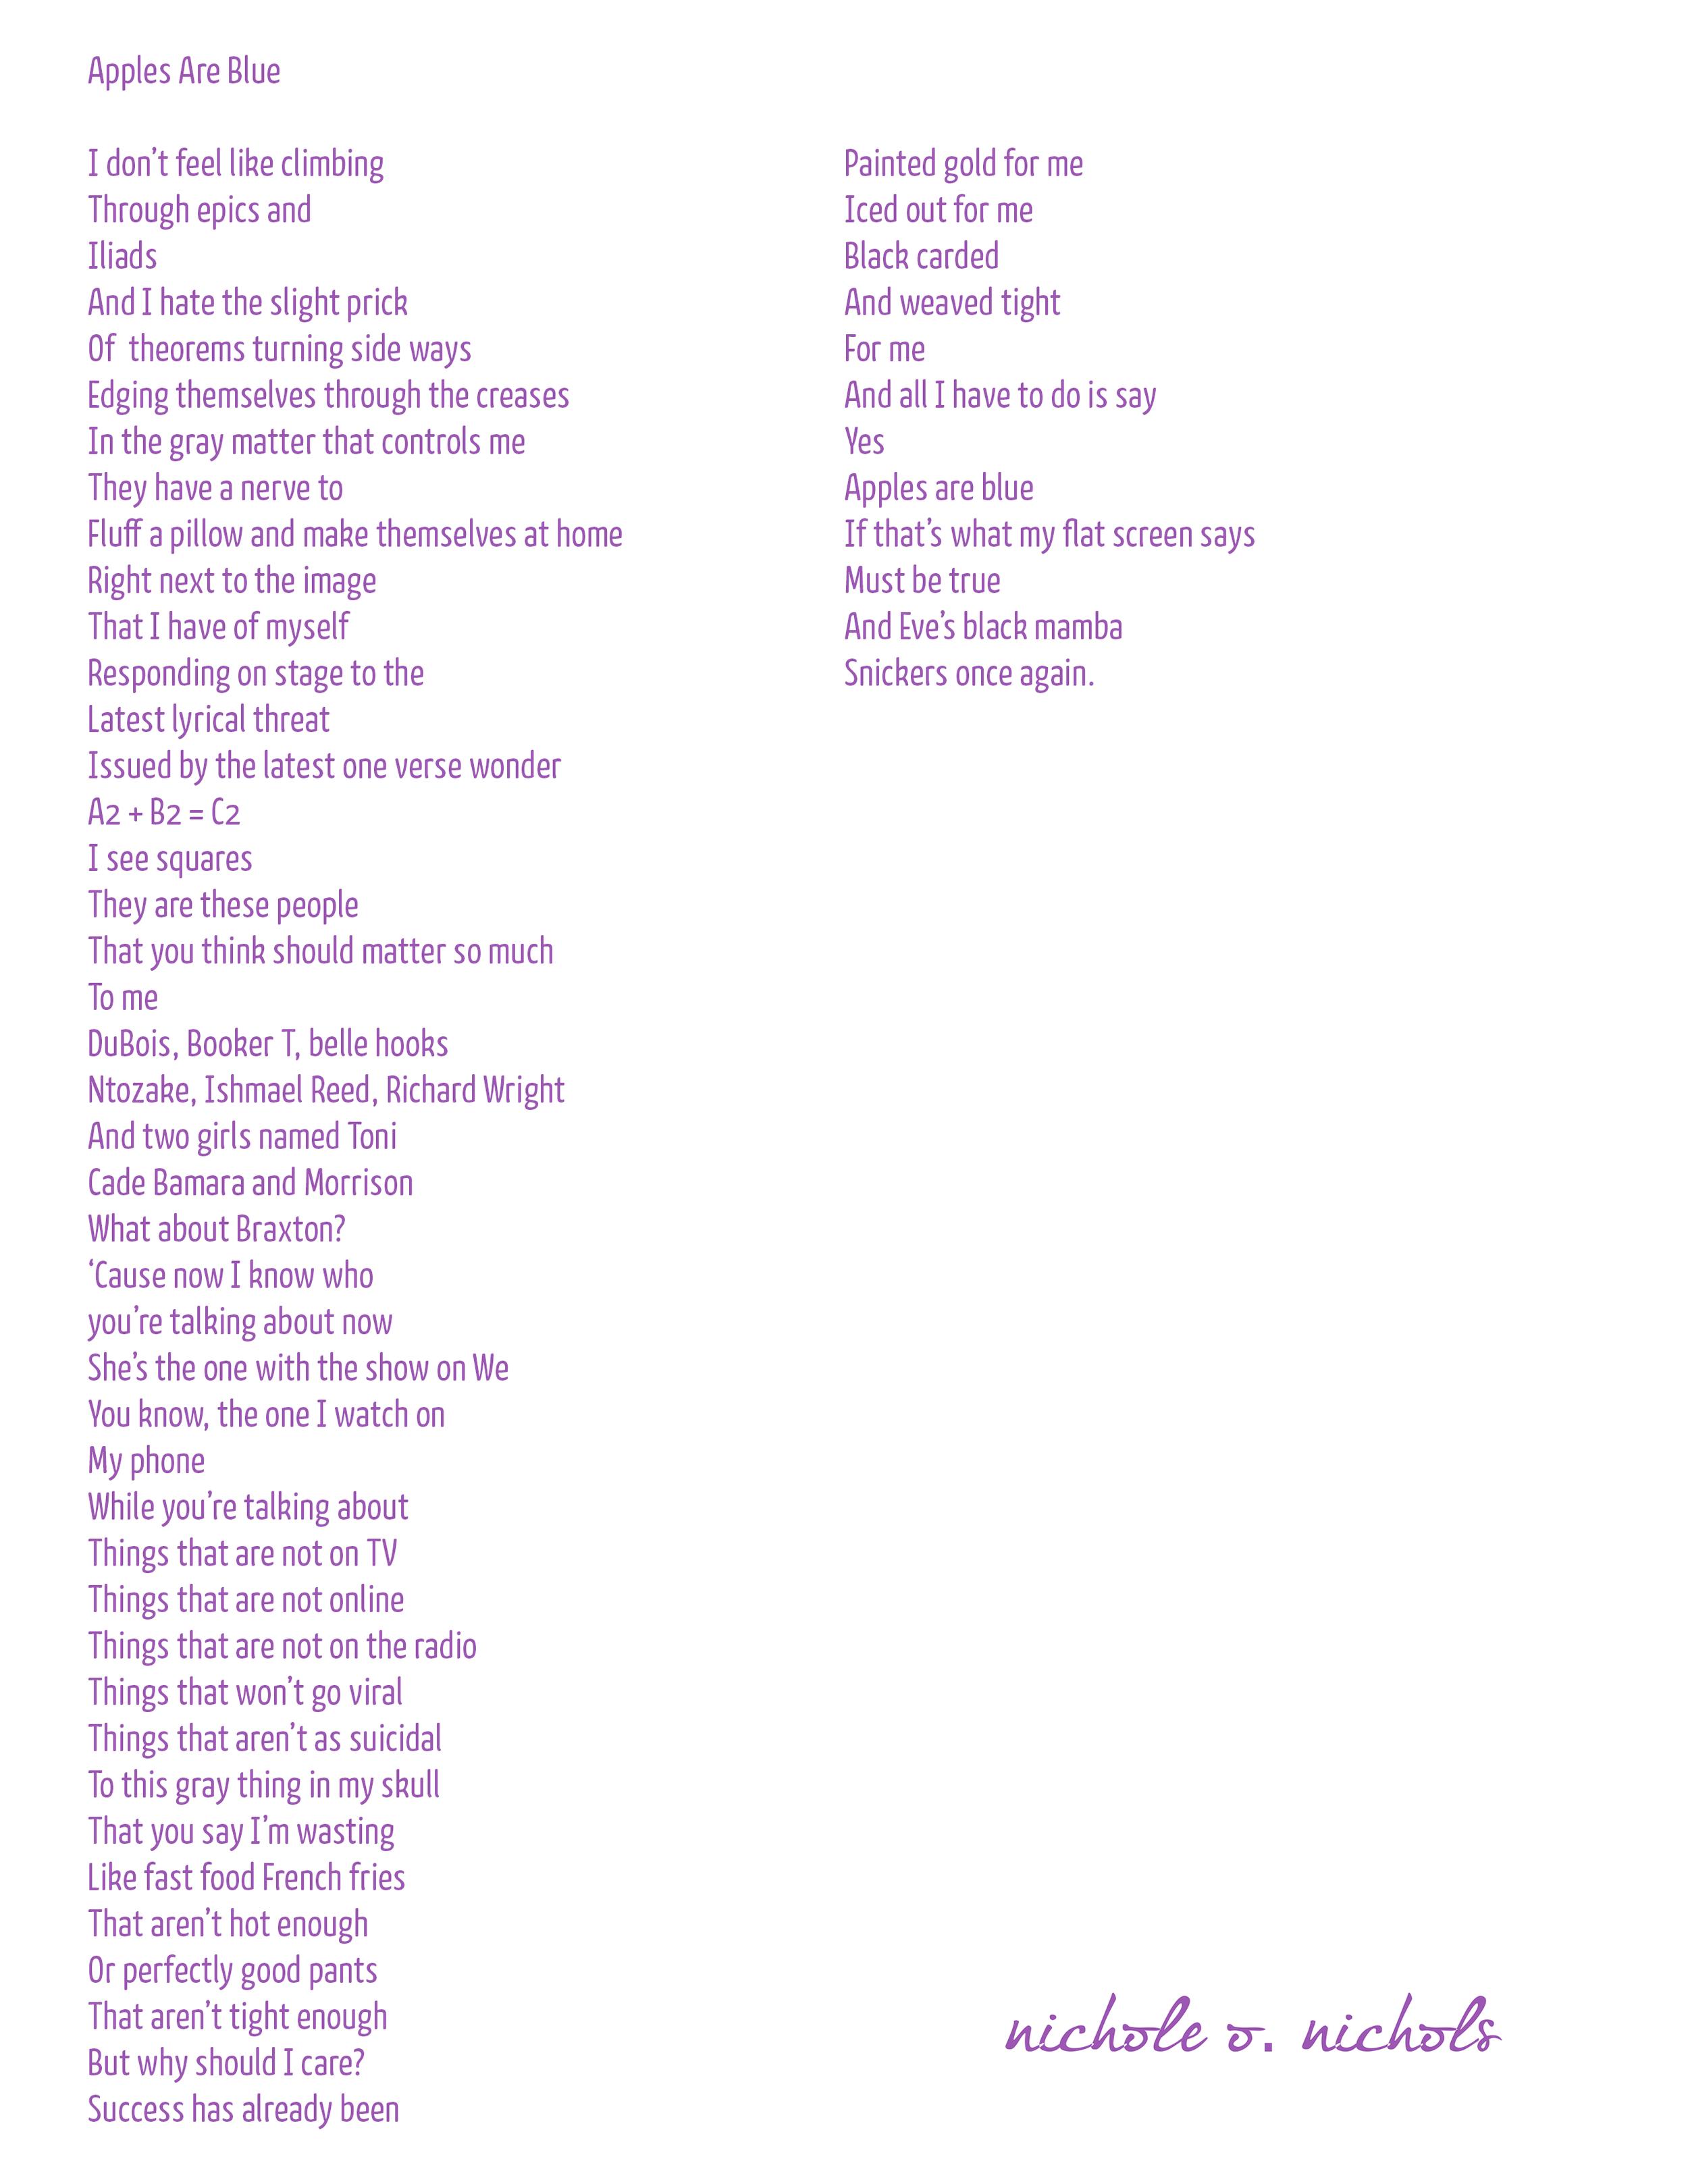 Poem_ApplesAreBlue_CORRECTED